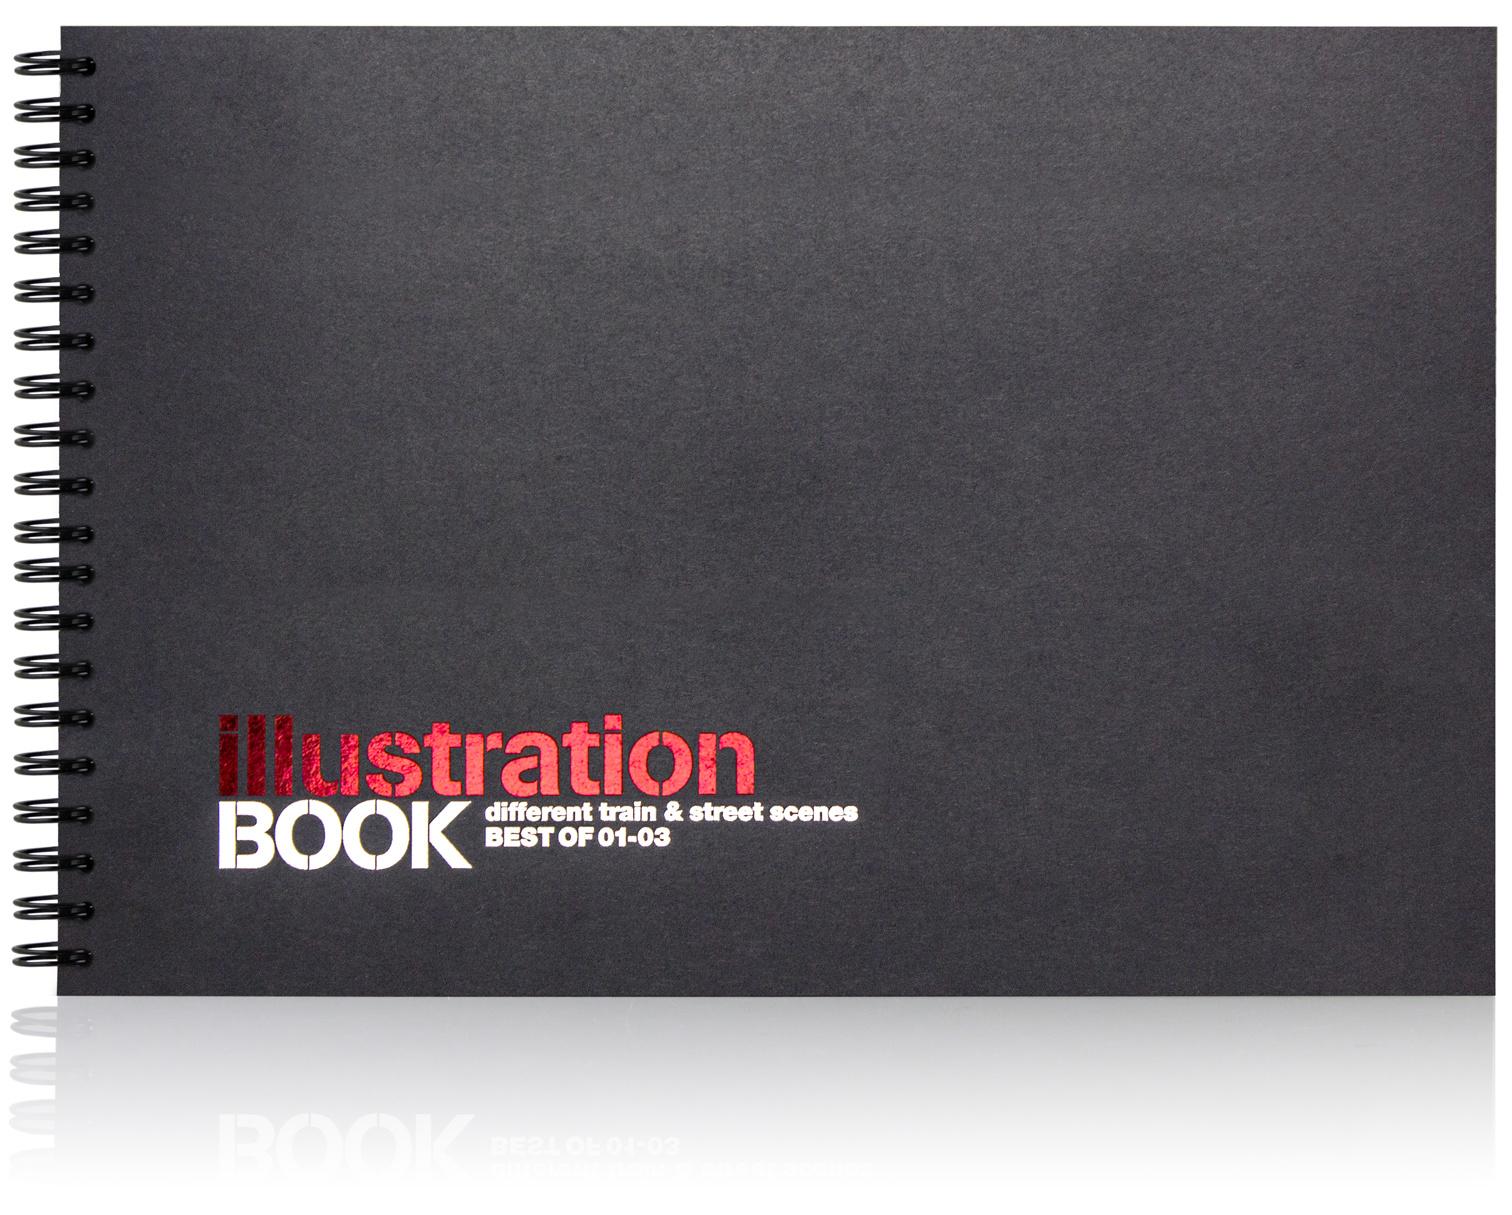 "Montana  Illustration Book Best of #1 - #3"""